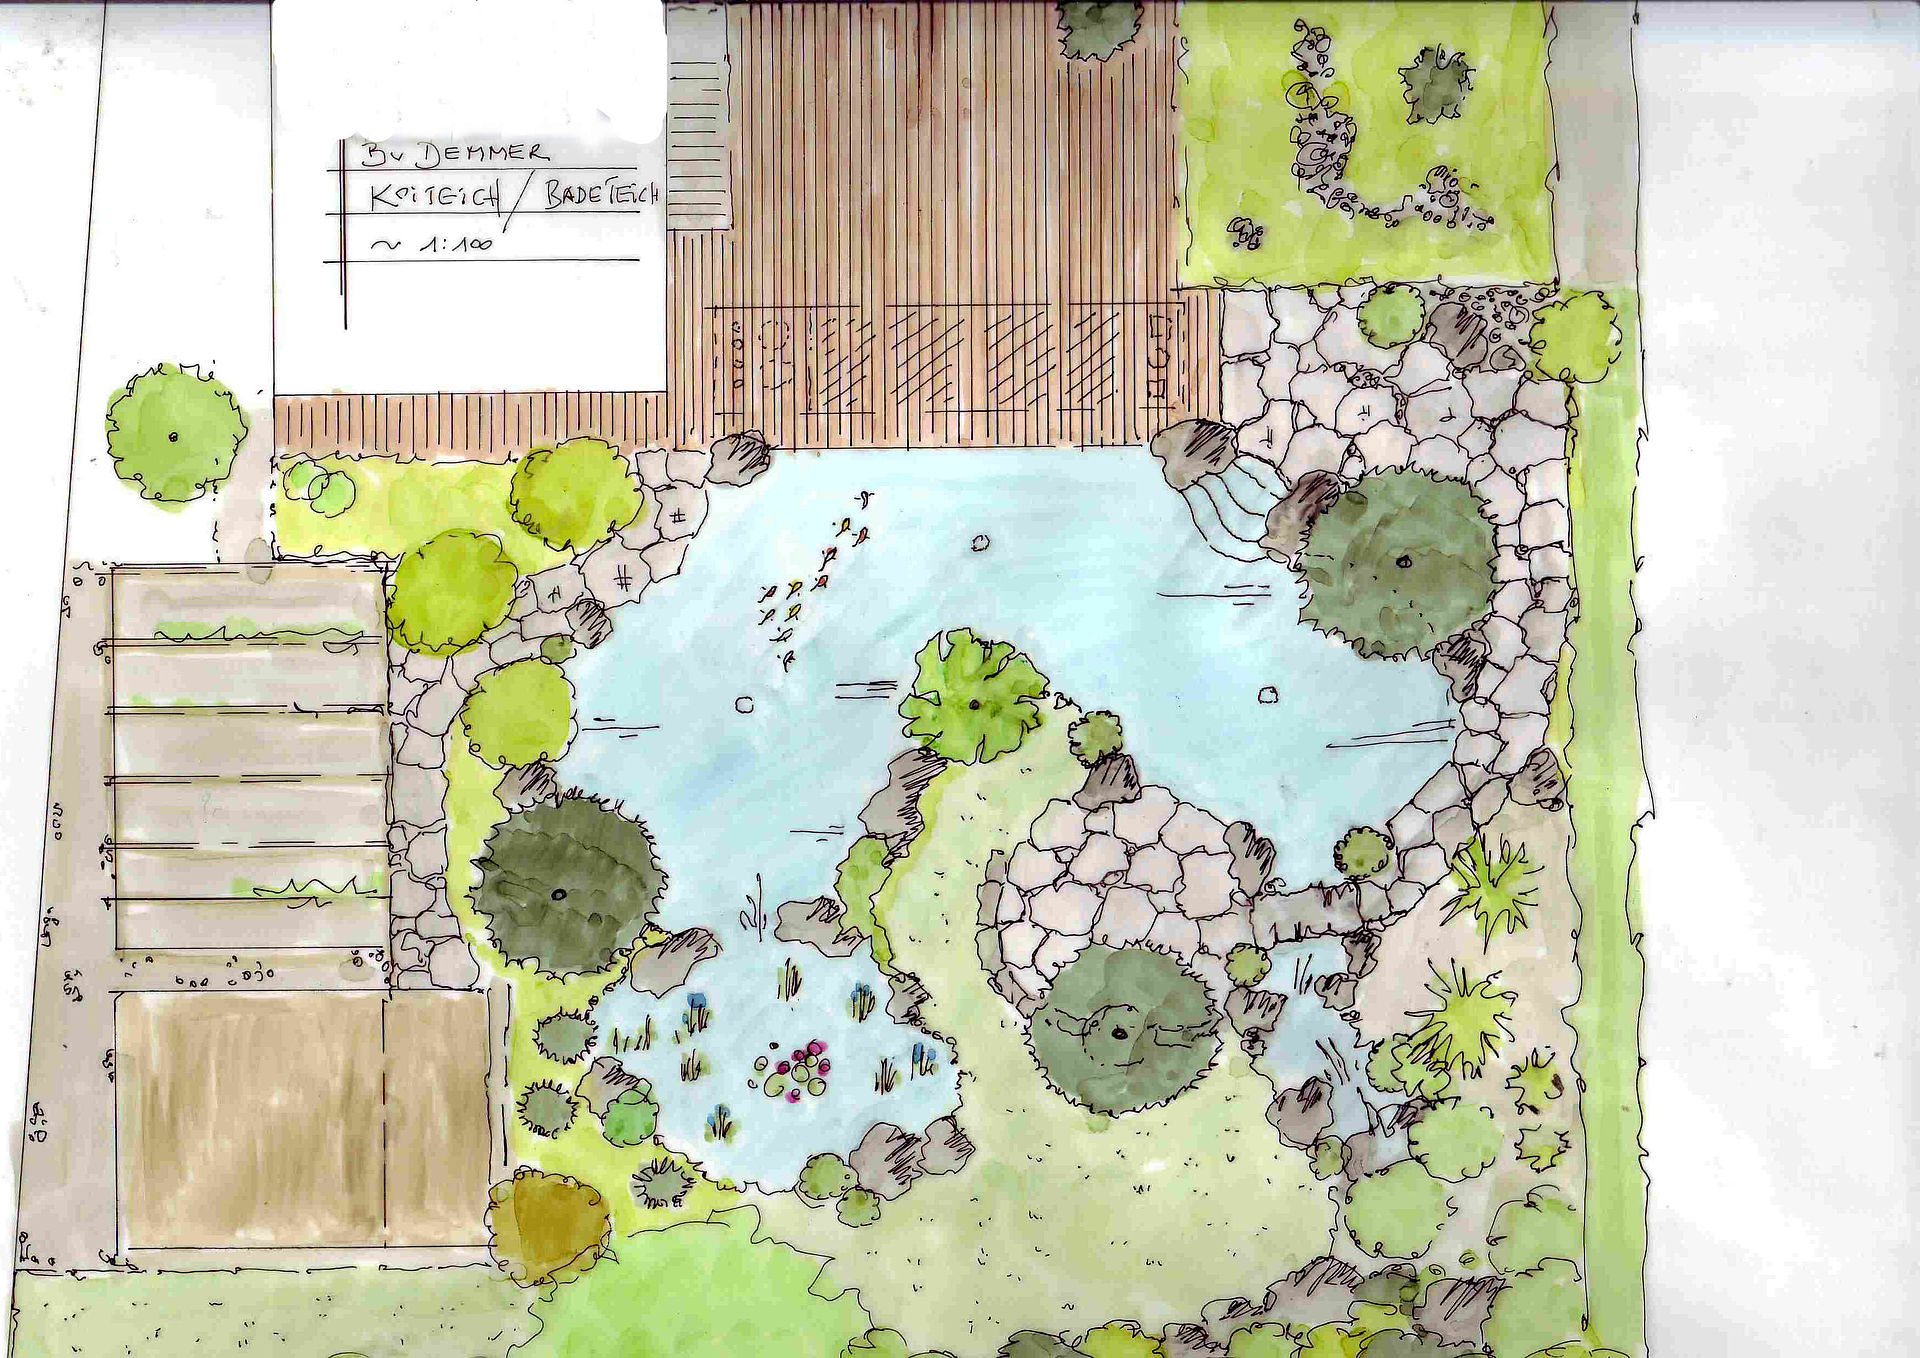 Gartenplanung: Gartenbau • Gartenplanung • Landschaftsbau